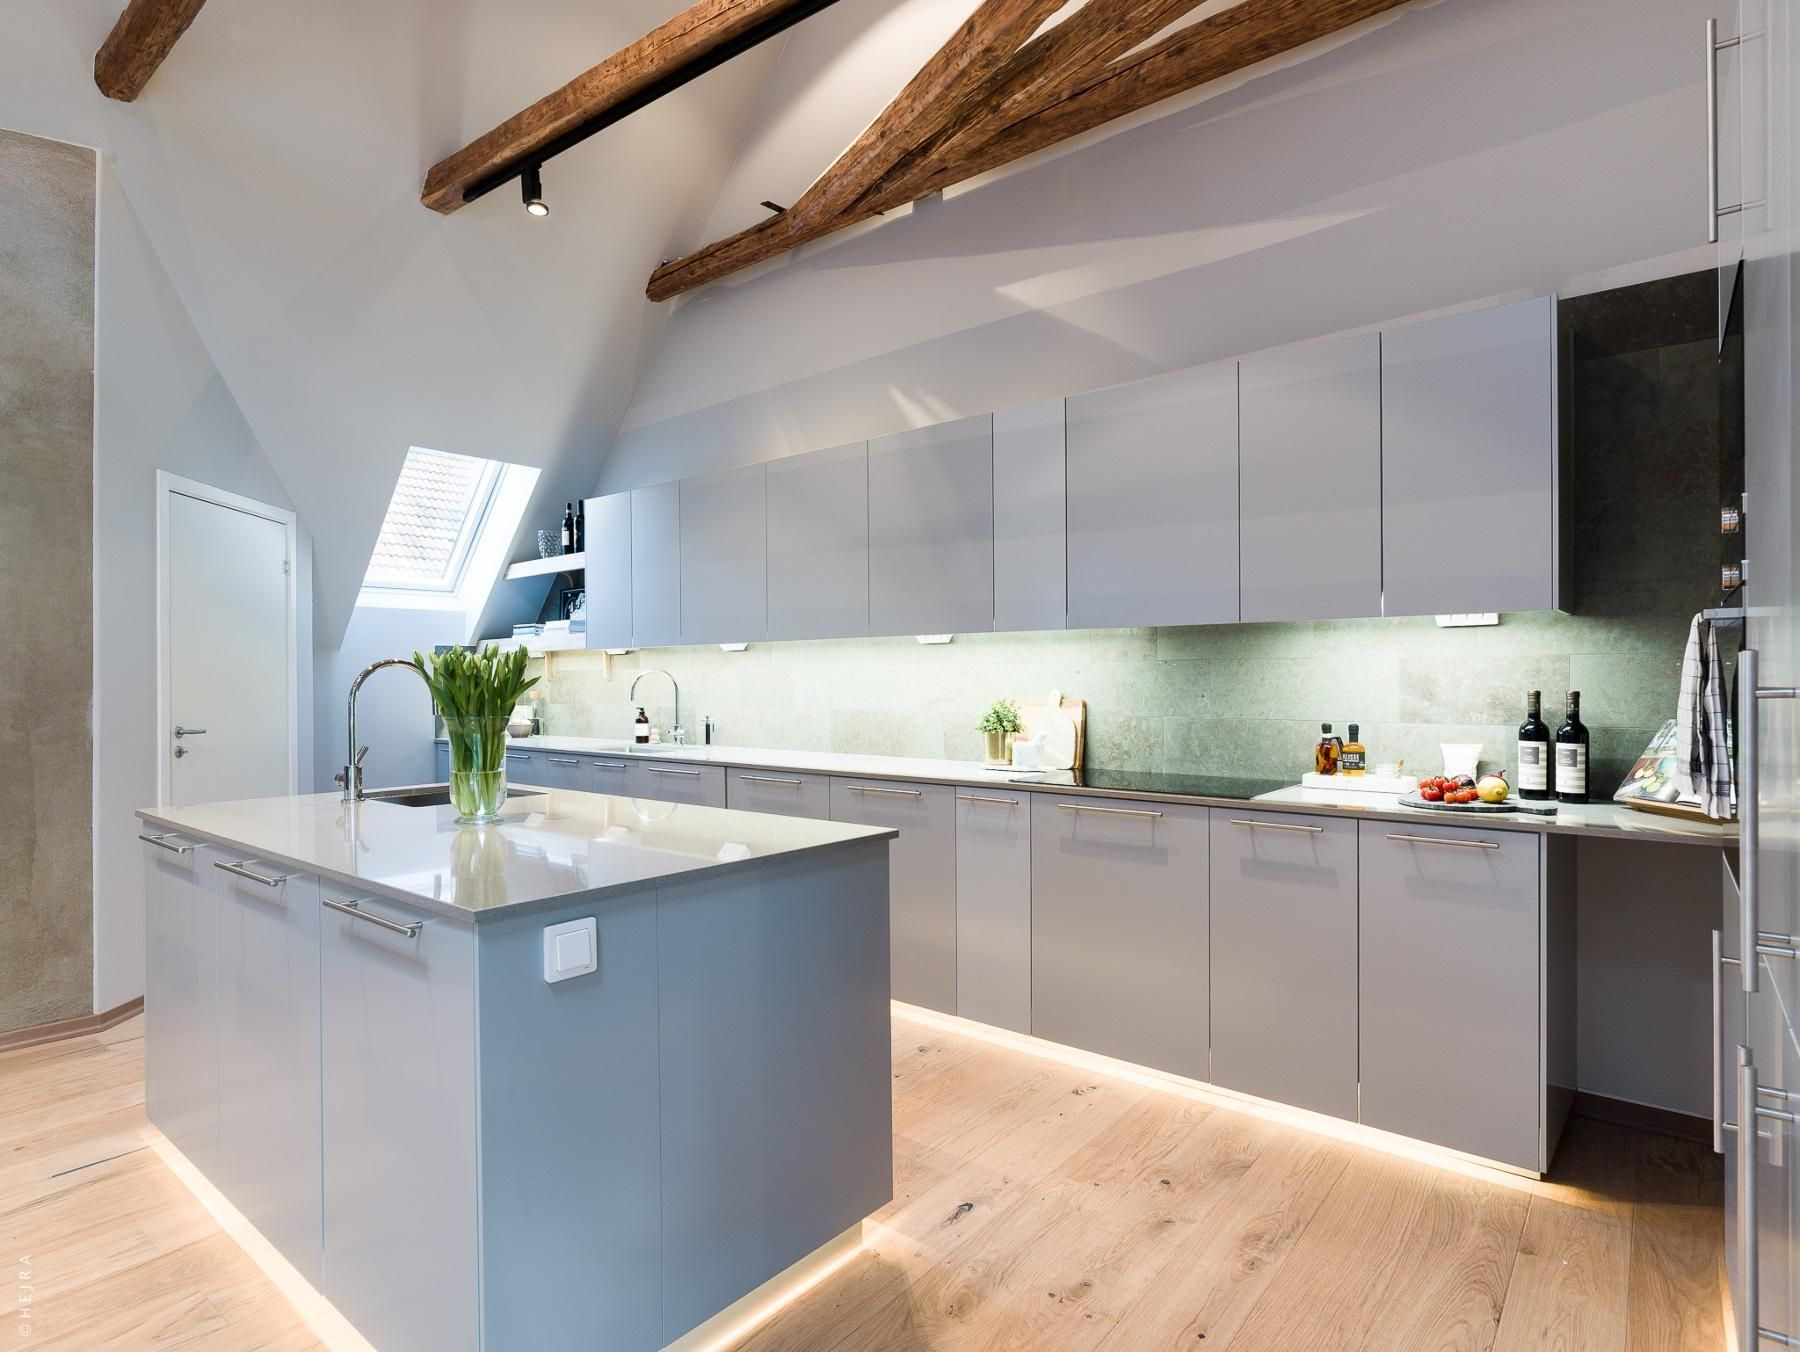 Murs à effet sous les toits | Cucinare in mansarda | Cucine ...